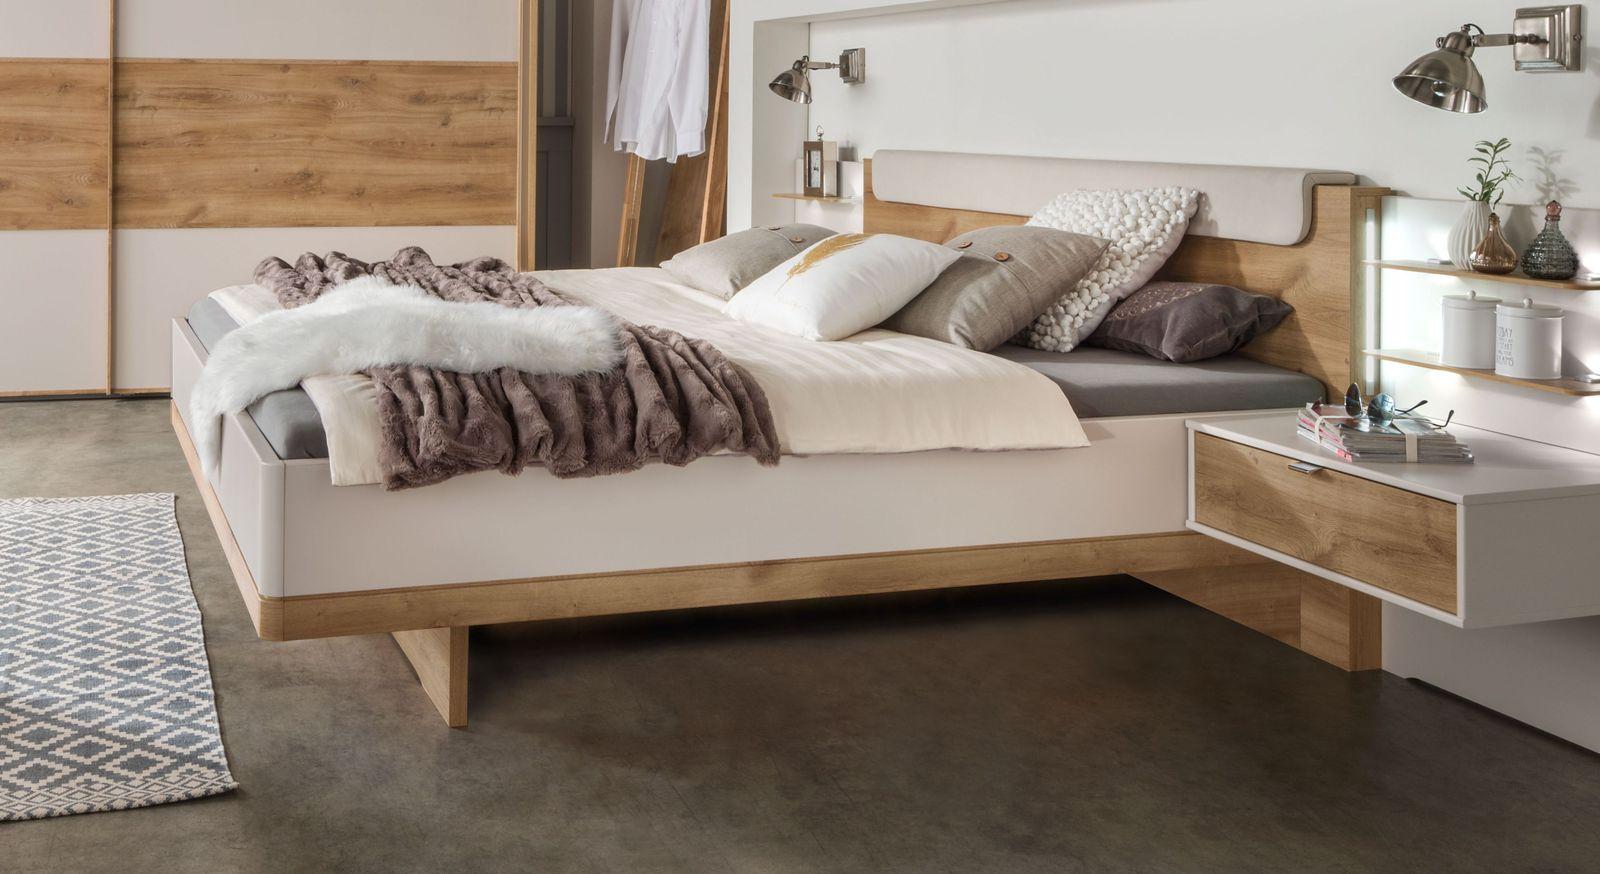 Bett Seabrook im stilvollem Design